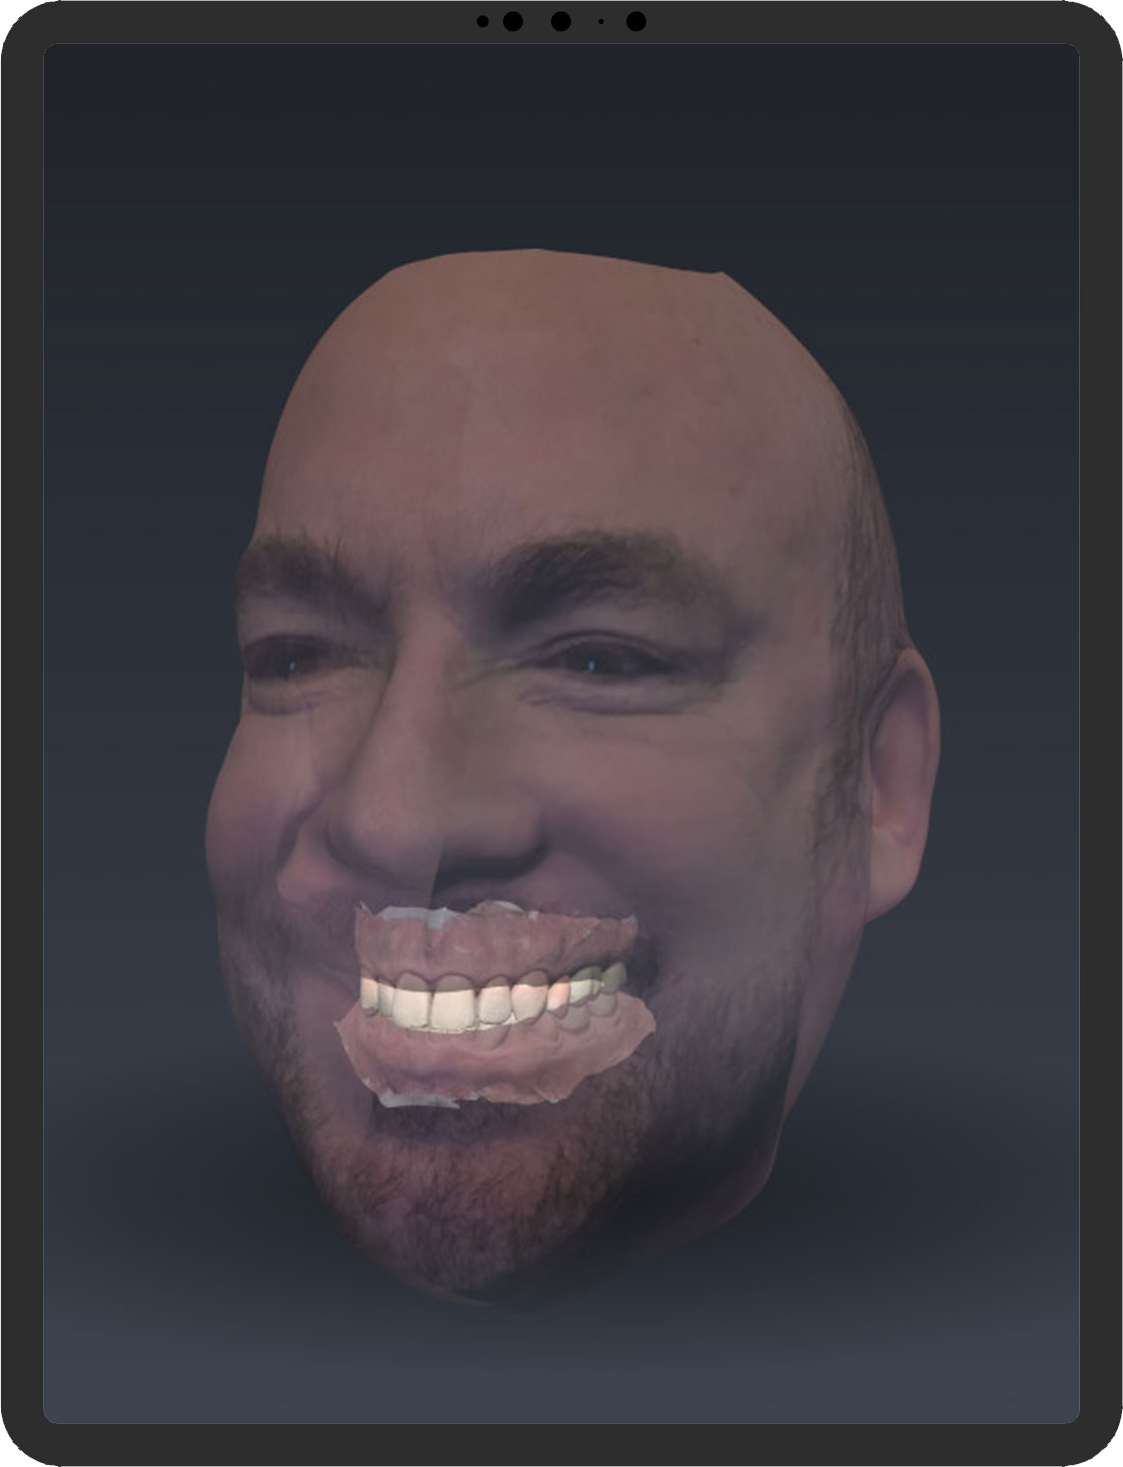 jaw-aligment